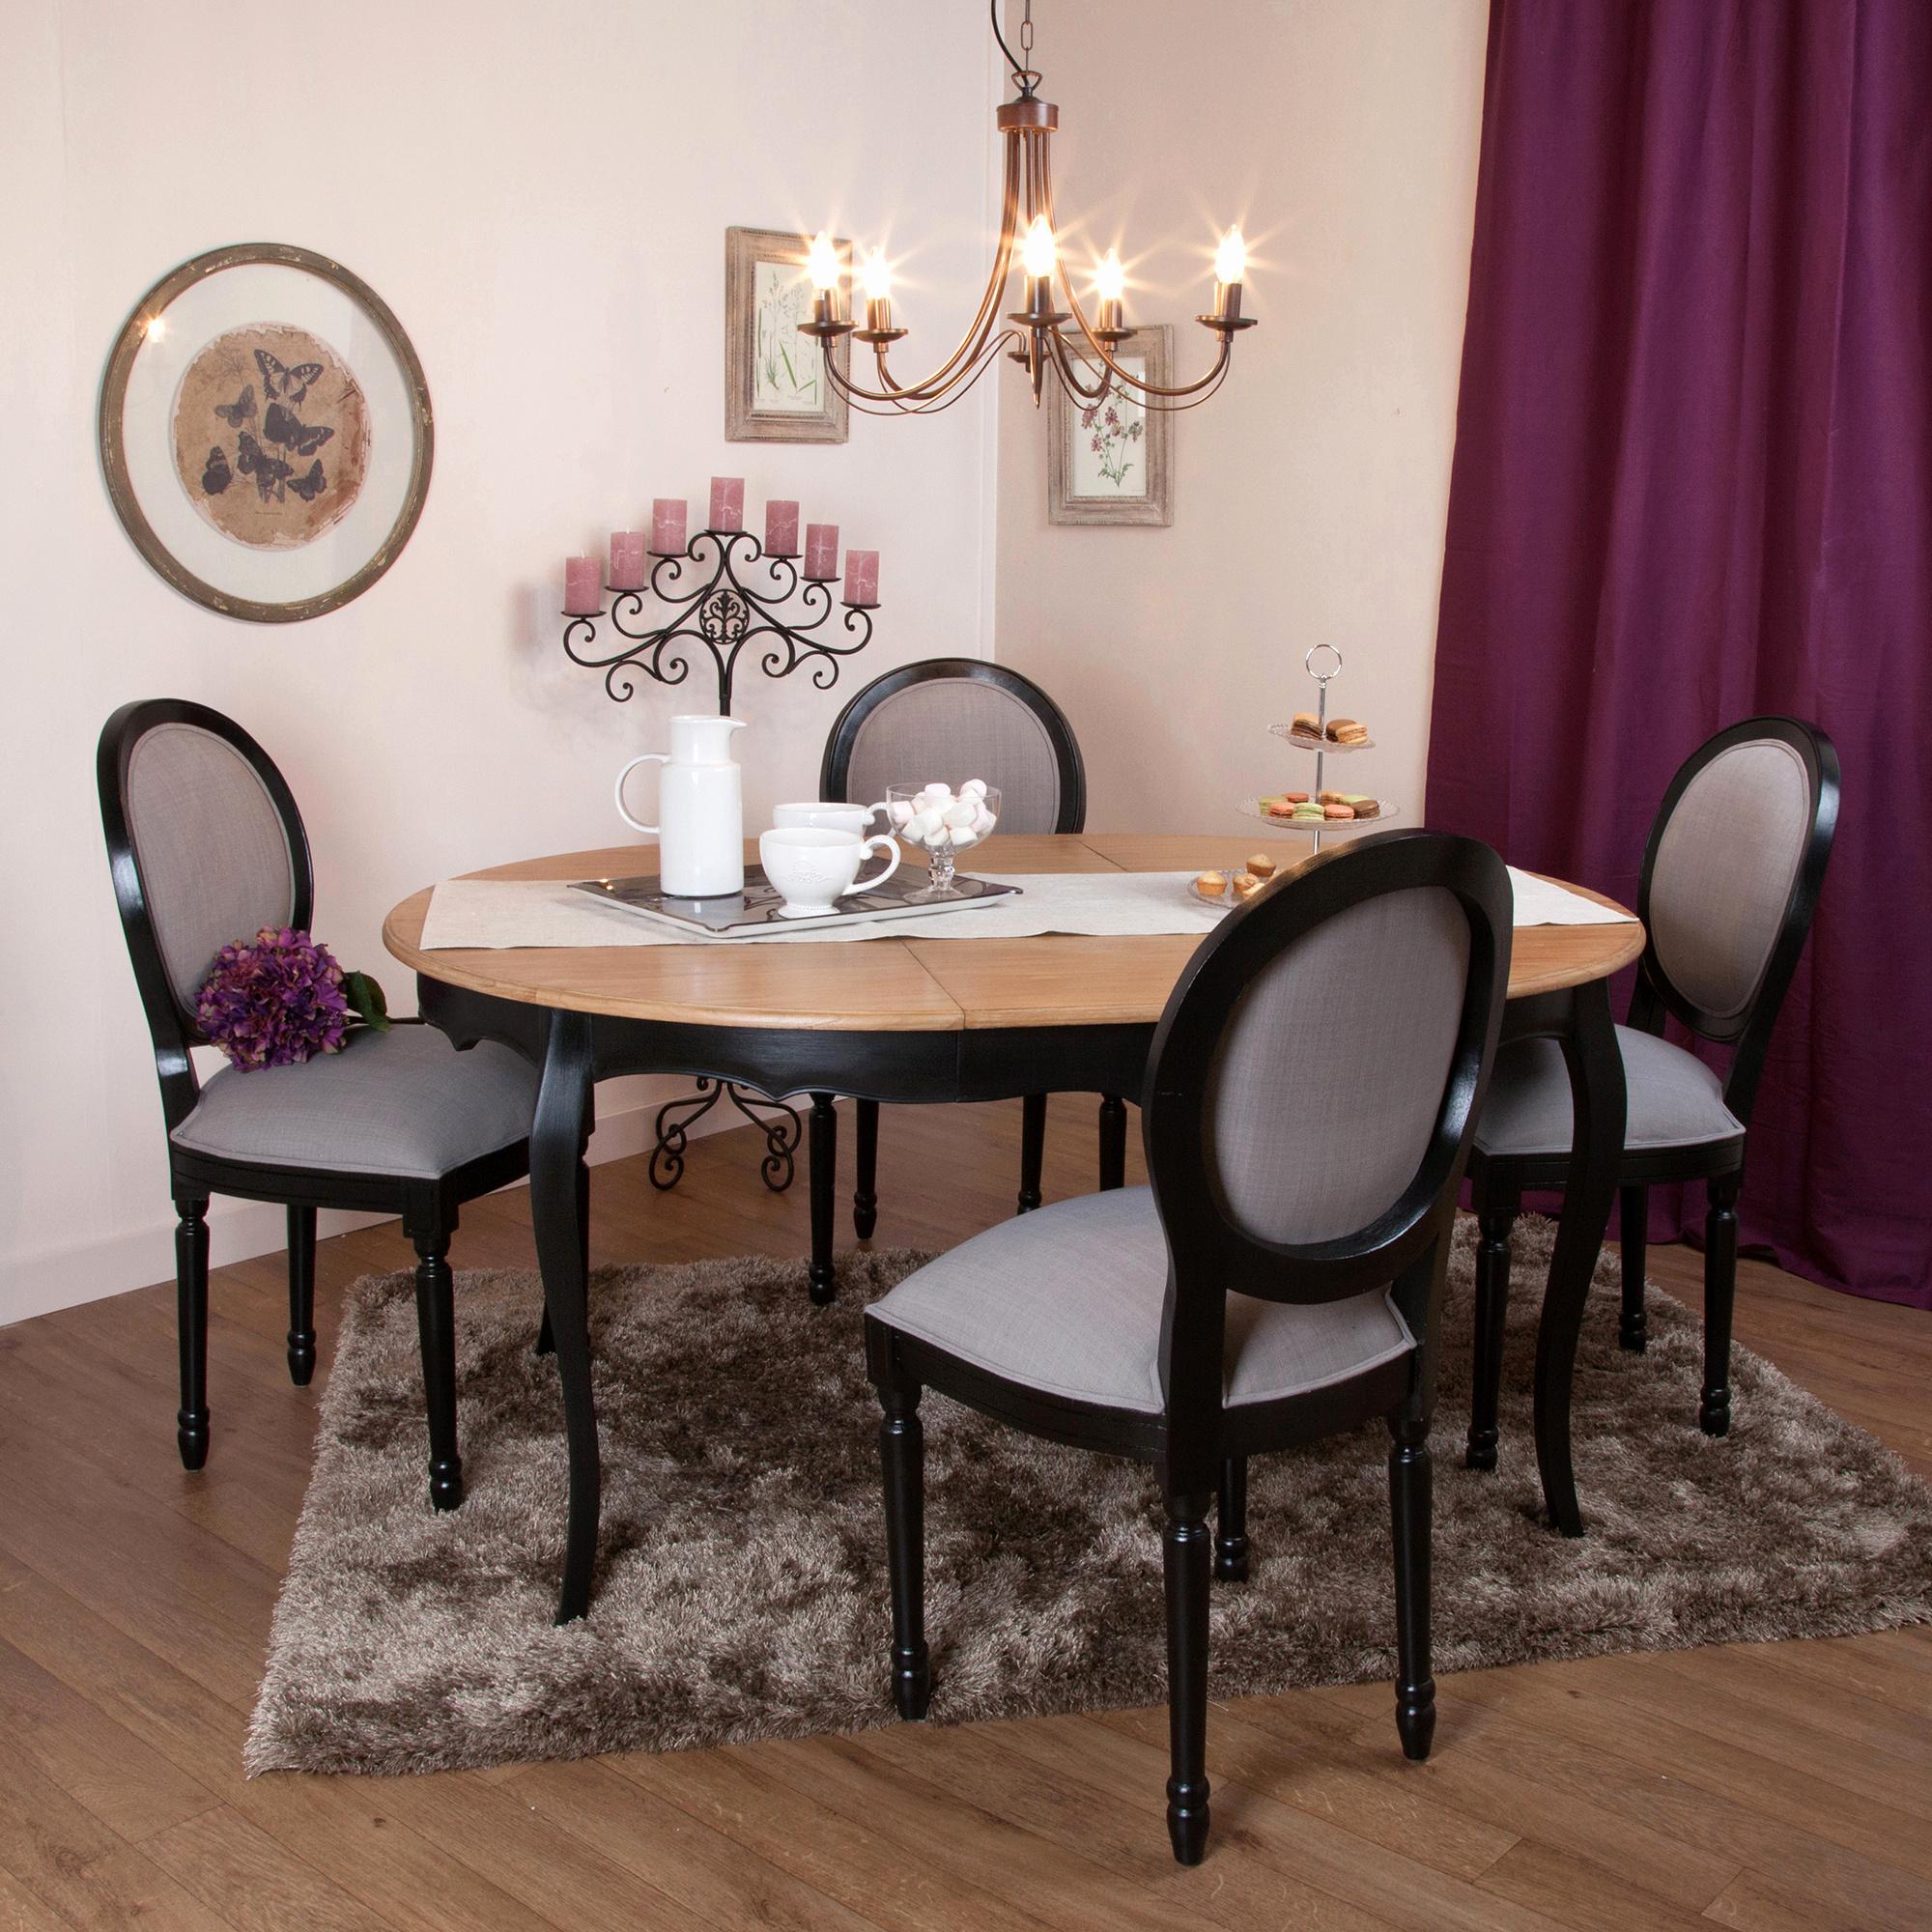 Charmant Table Avec Banc Salle A Manger - Luckytroll intérieur Table Salle A Manger Pliante Ikea